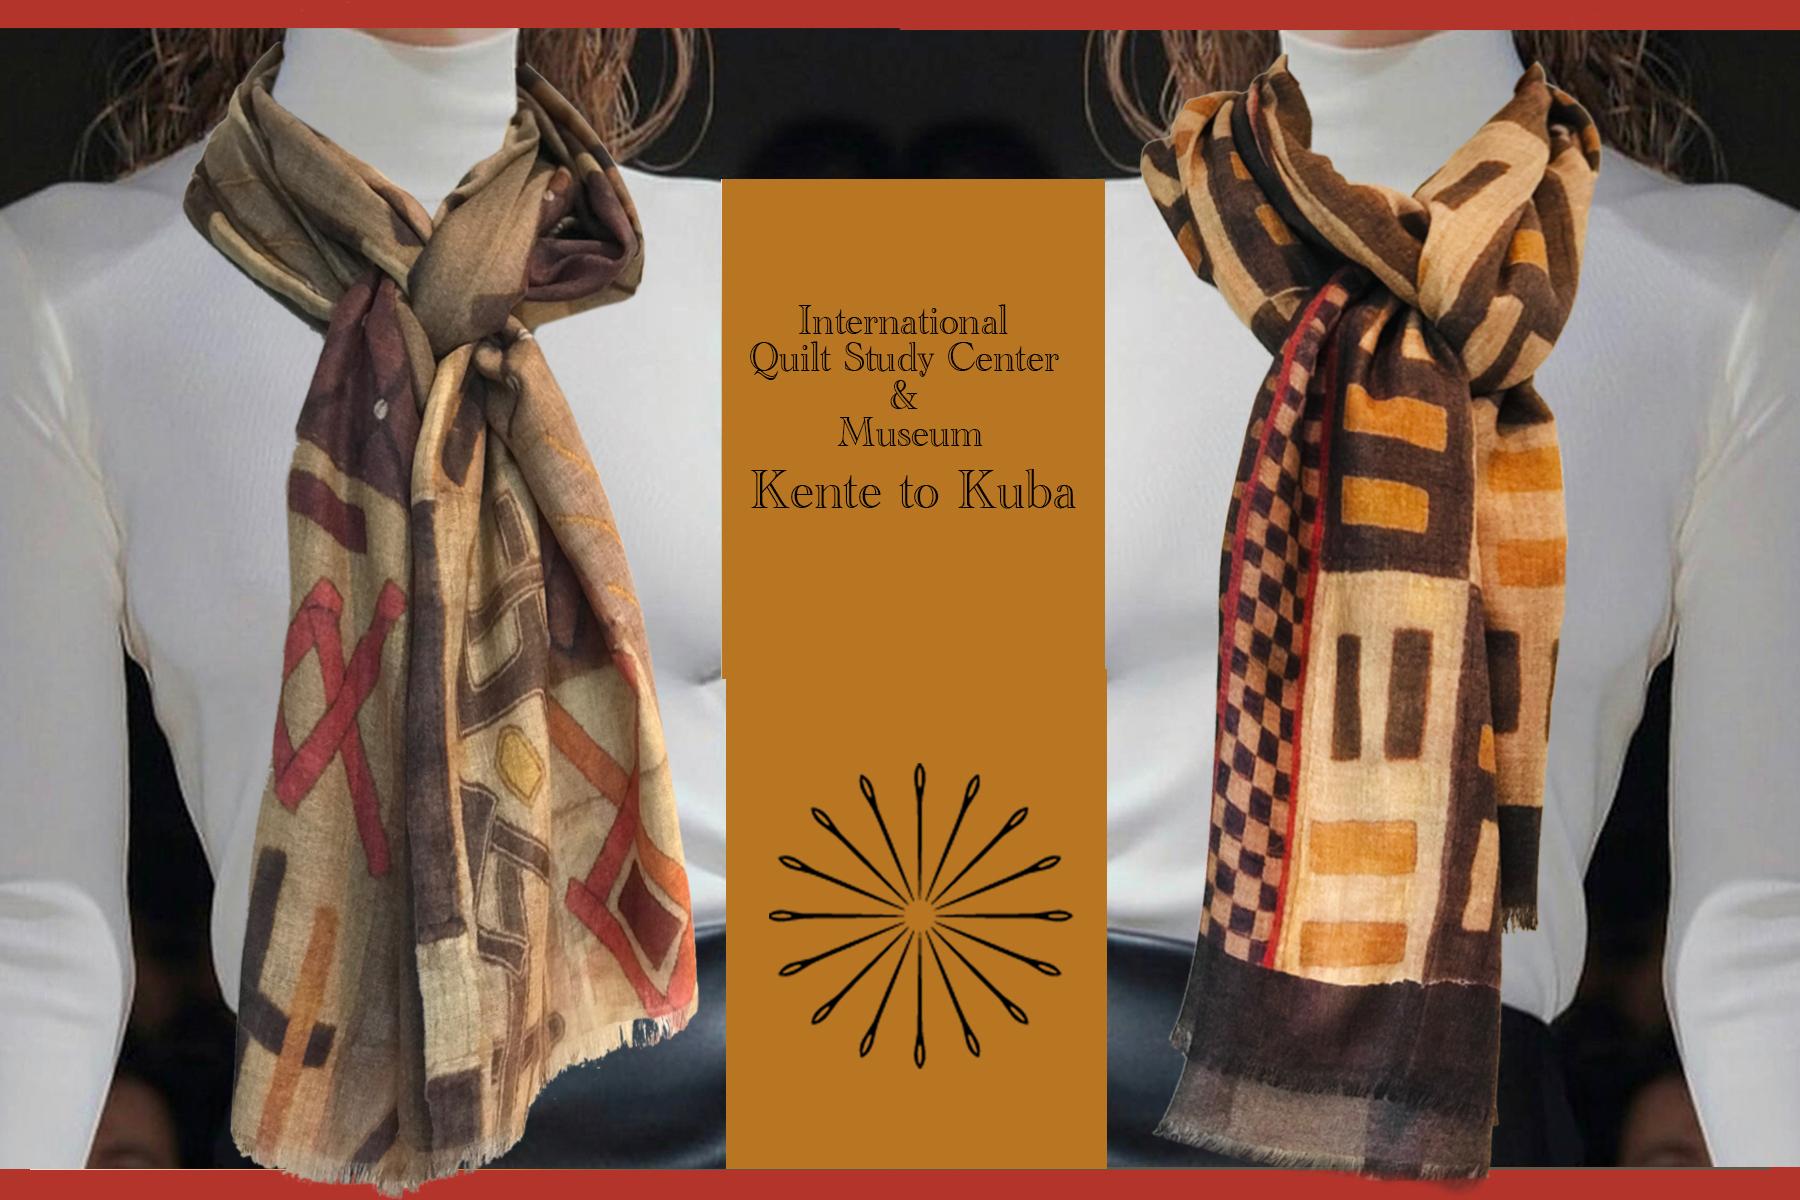 KENTE TO KUBA - INTERNATIONAL QUILT STUDY CENTER & MUSEUM